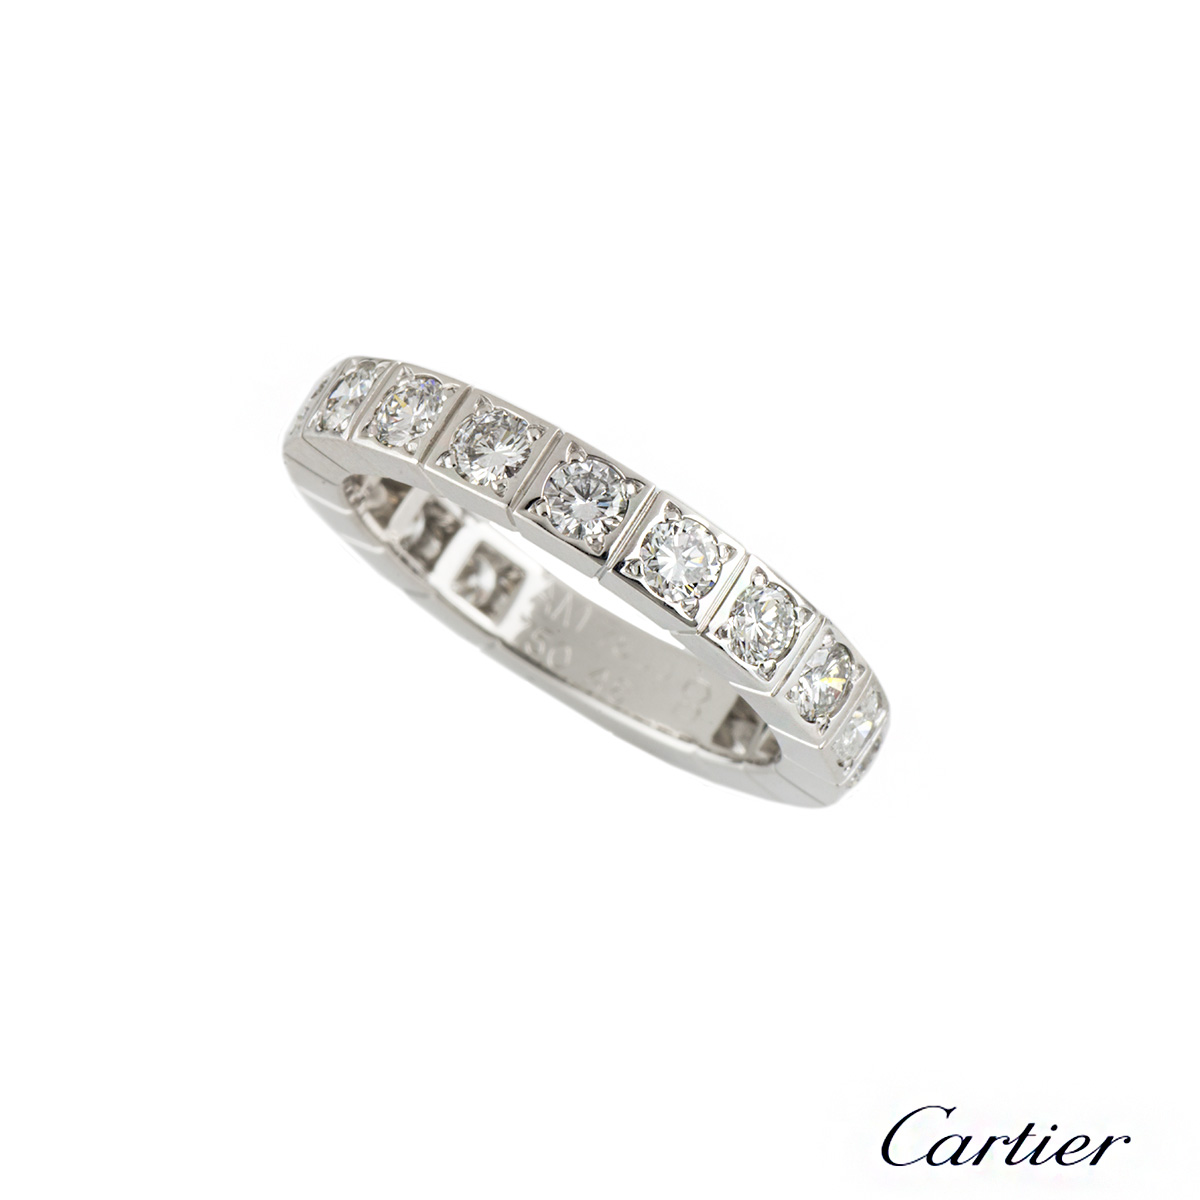 Cartier 18k White Gold Diamond Set Lanieres Ring